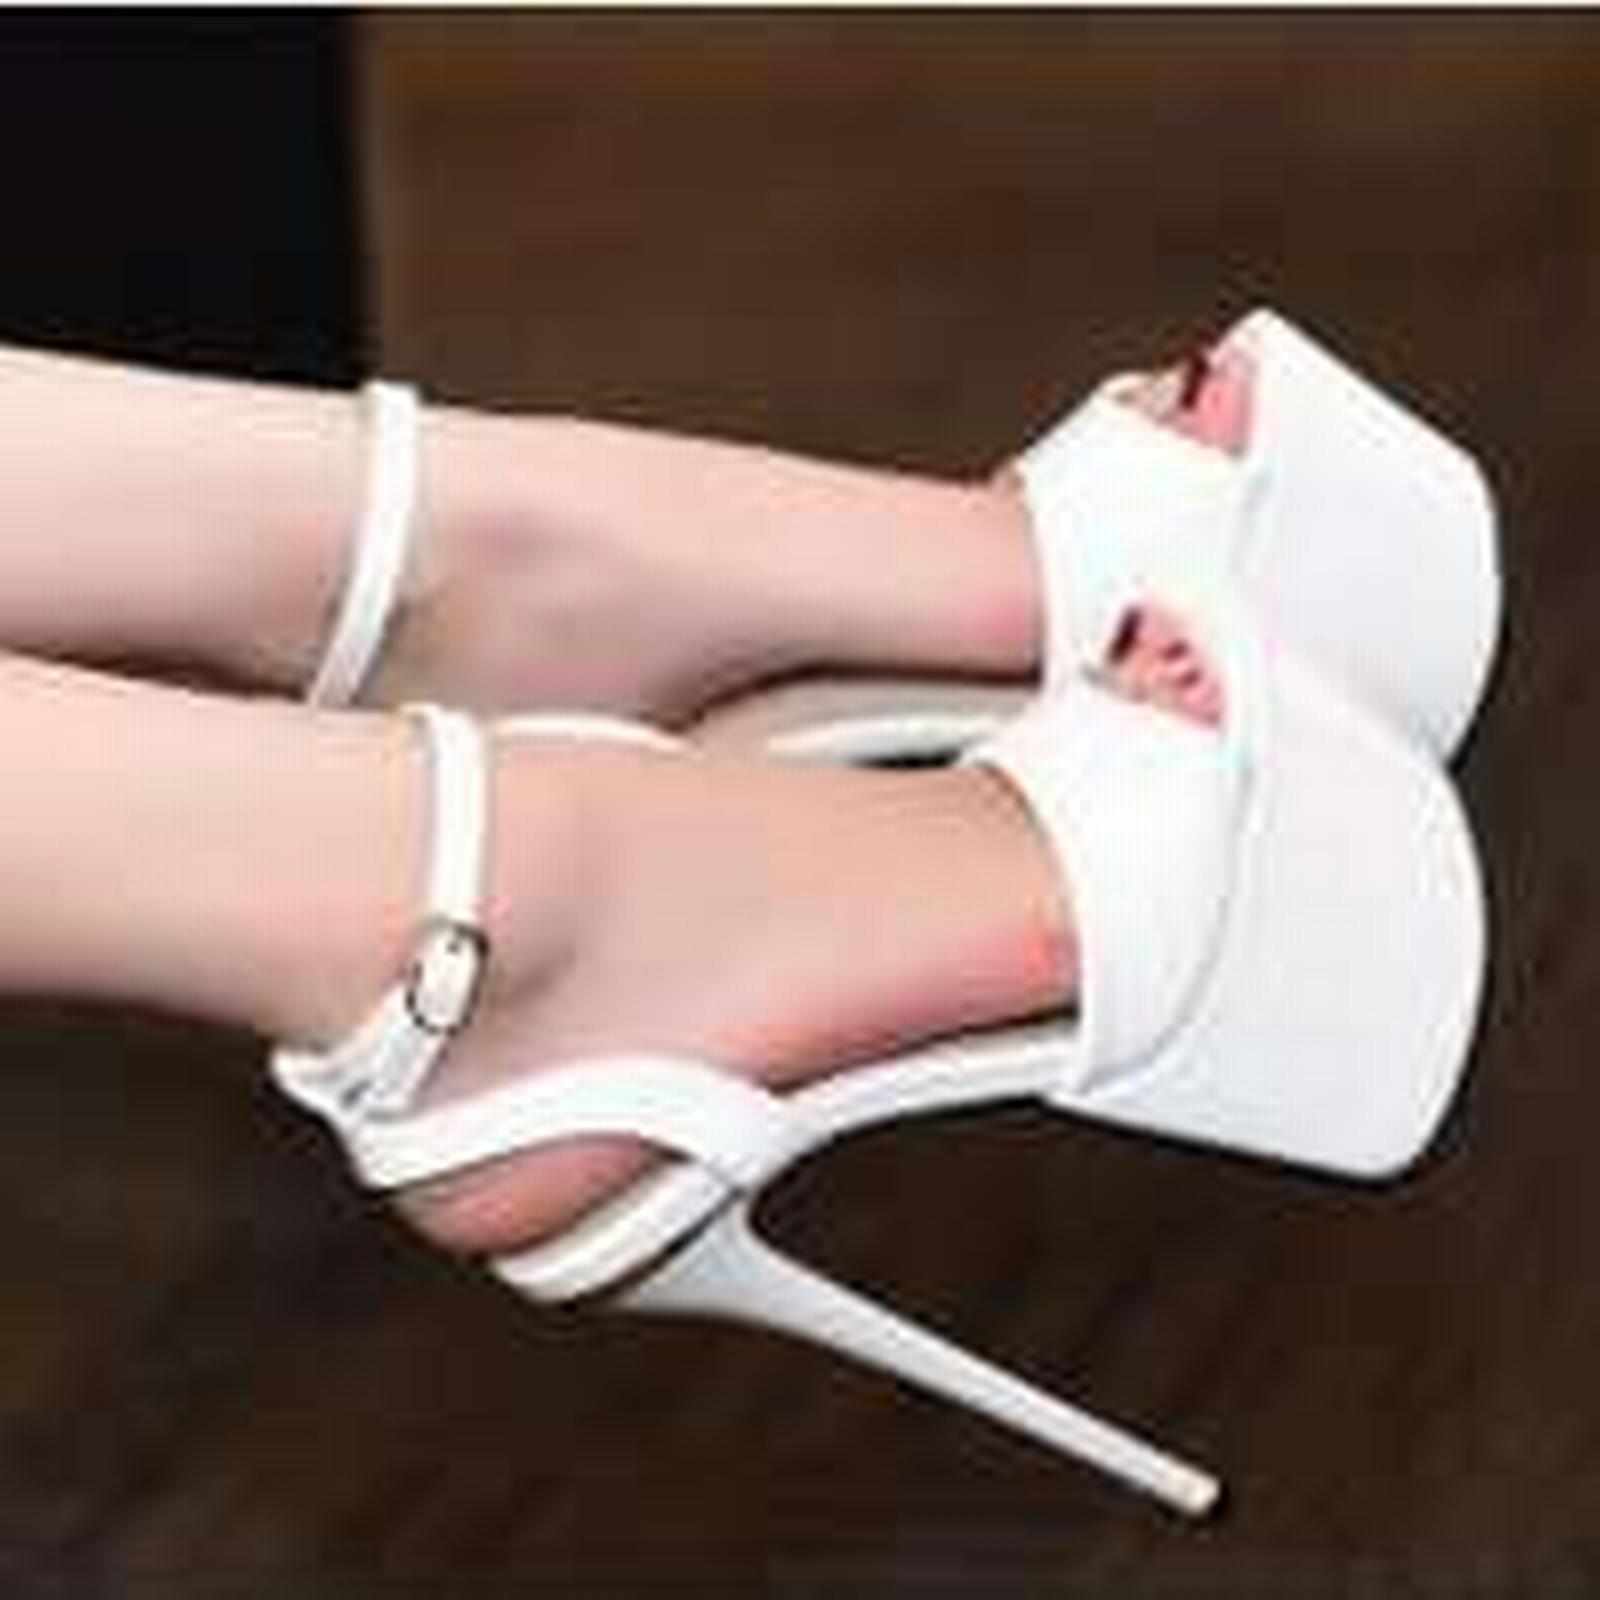 Bonanza (Global) ps306 Sexy 17 supper high heels sandals, 17 Sexy cm heels, US size 4-8, white b9df27